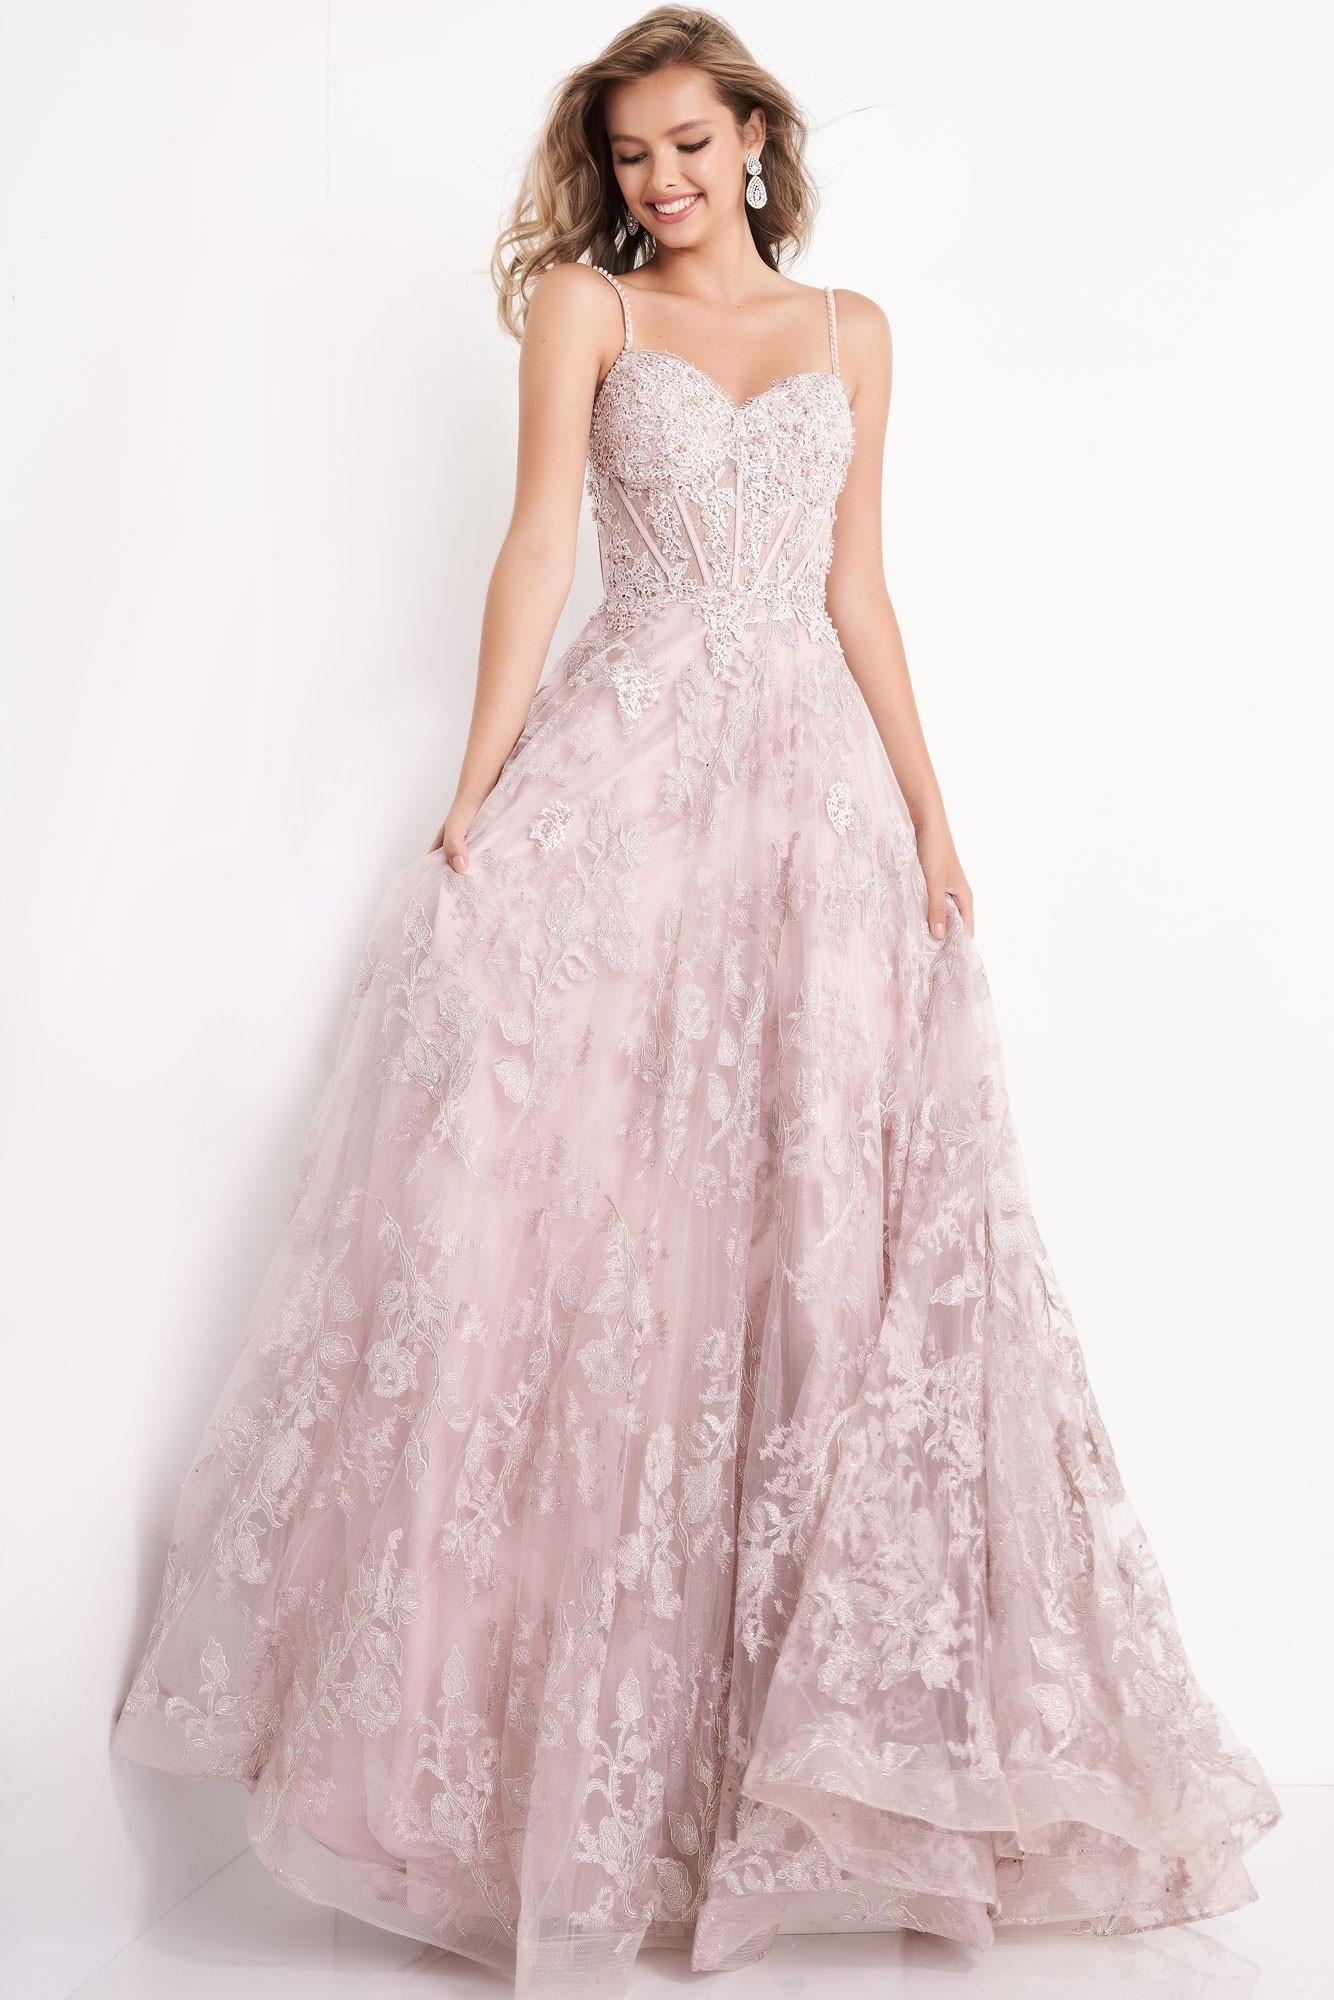 JVN by Jovani JVN06474 Lace Corset Bodice Ball Gown